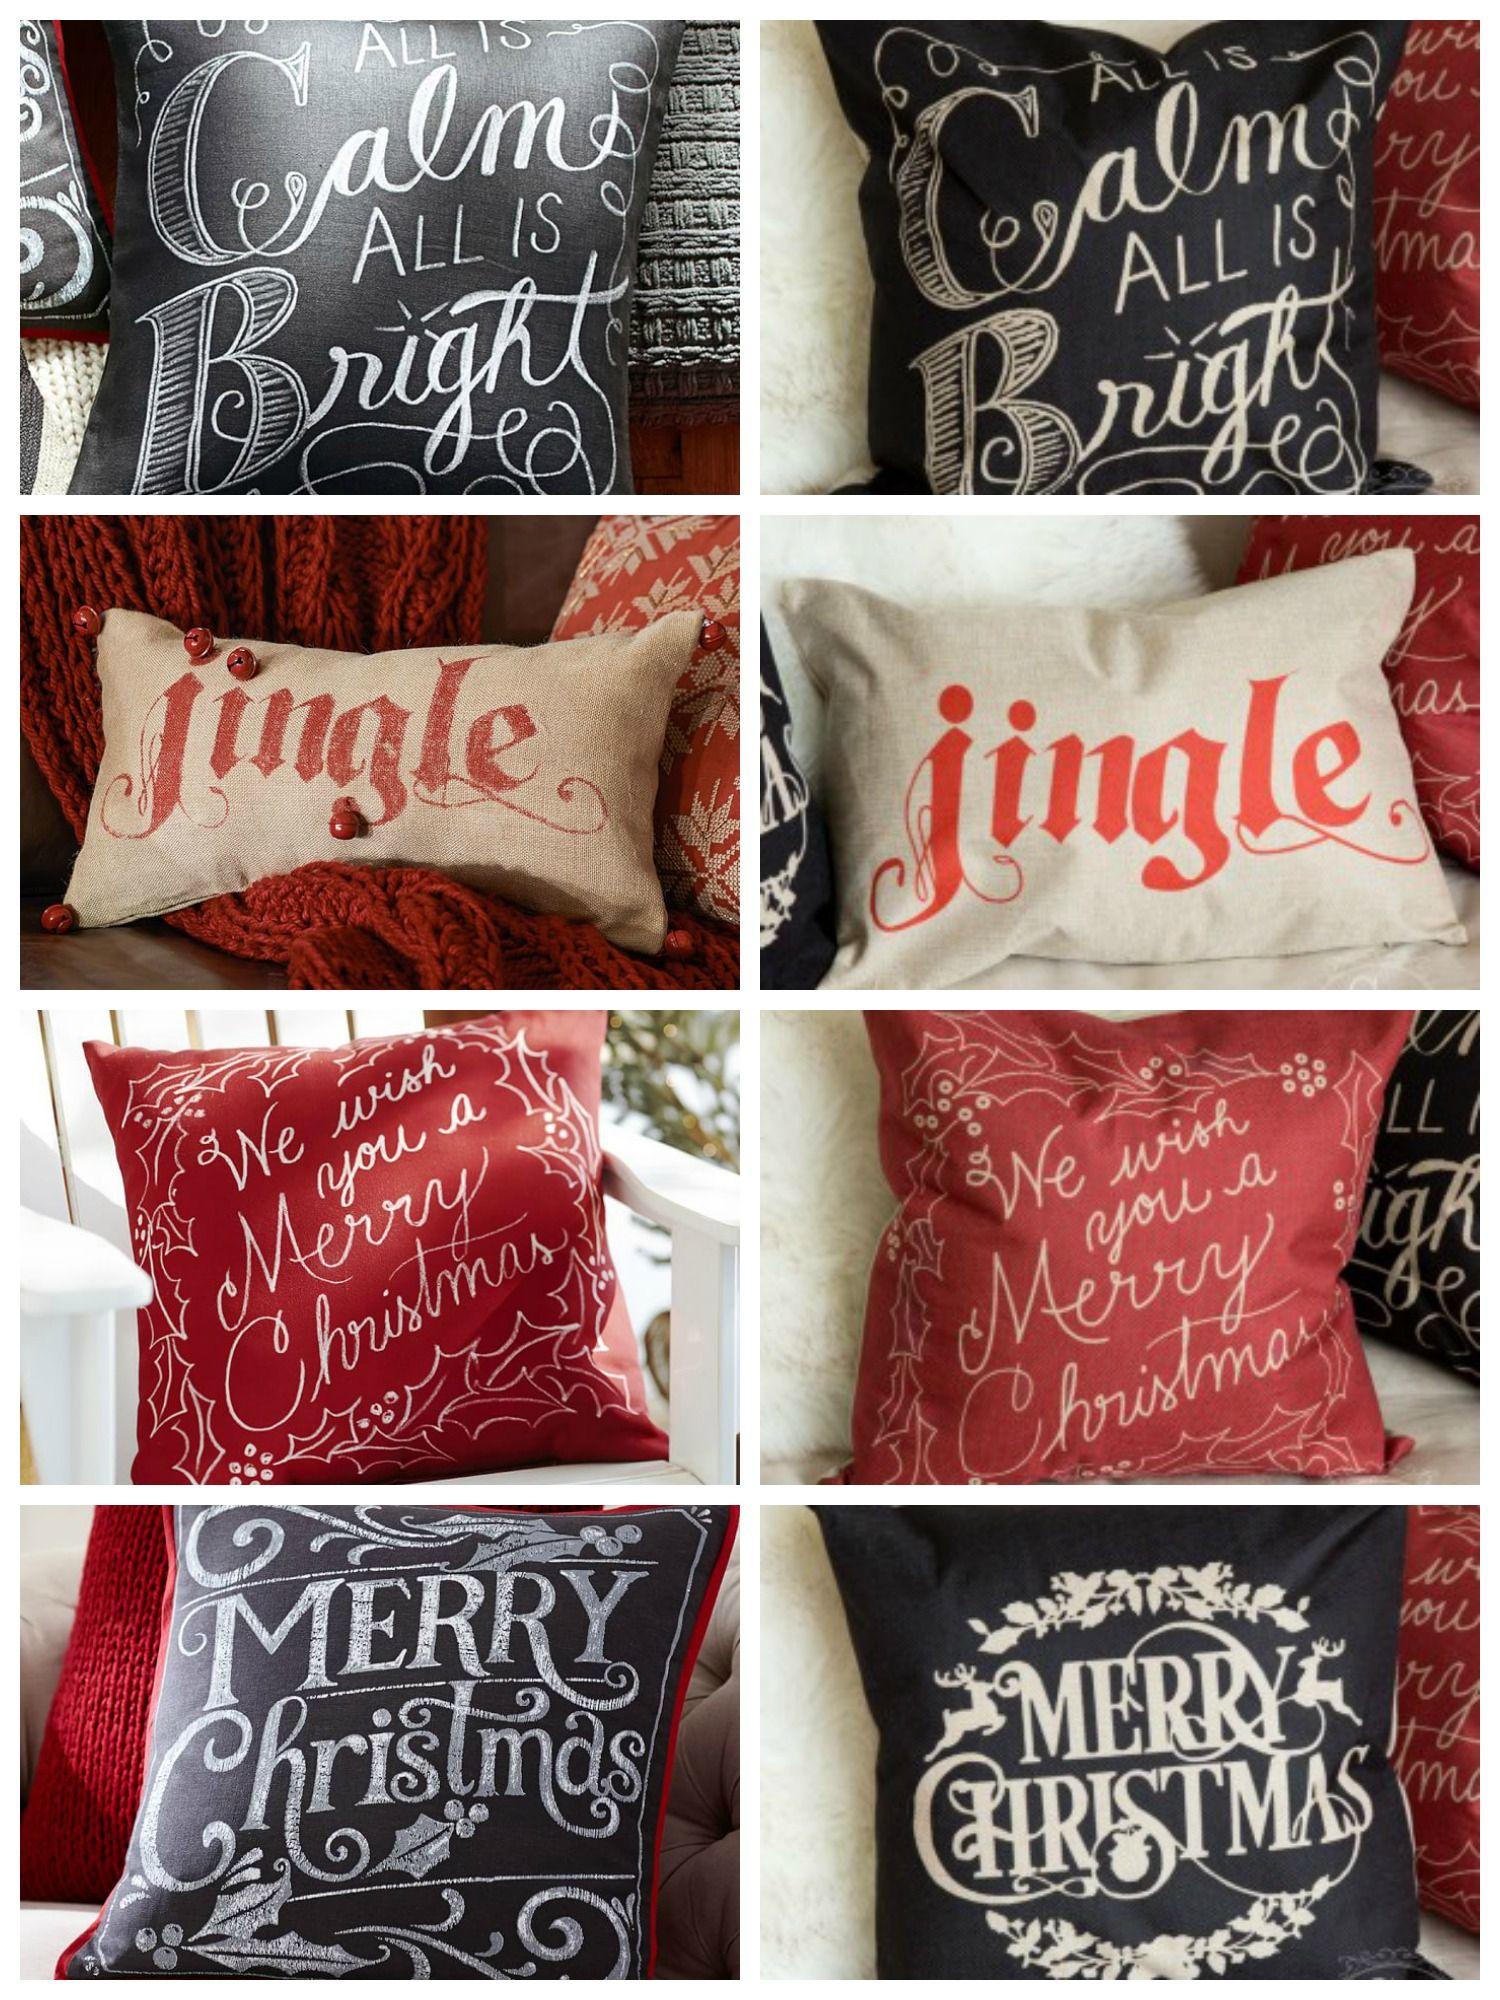 Pottery Barn Holiday Pillows Pottery Barn Christmas Holiday